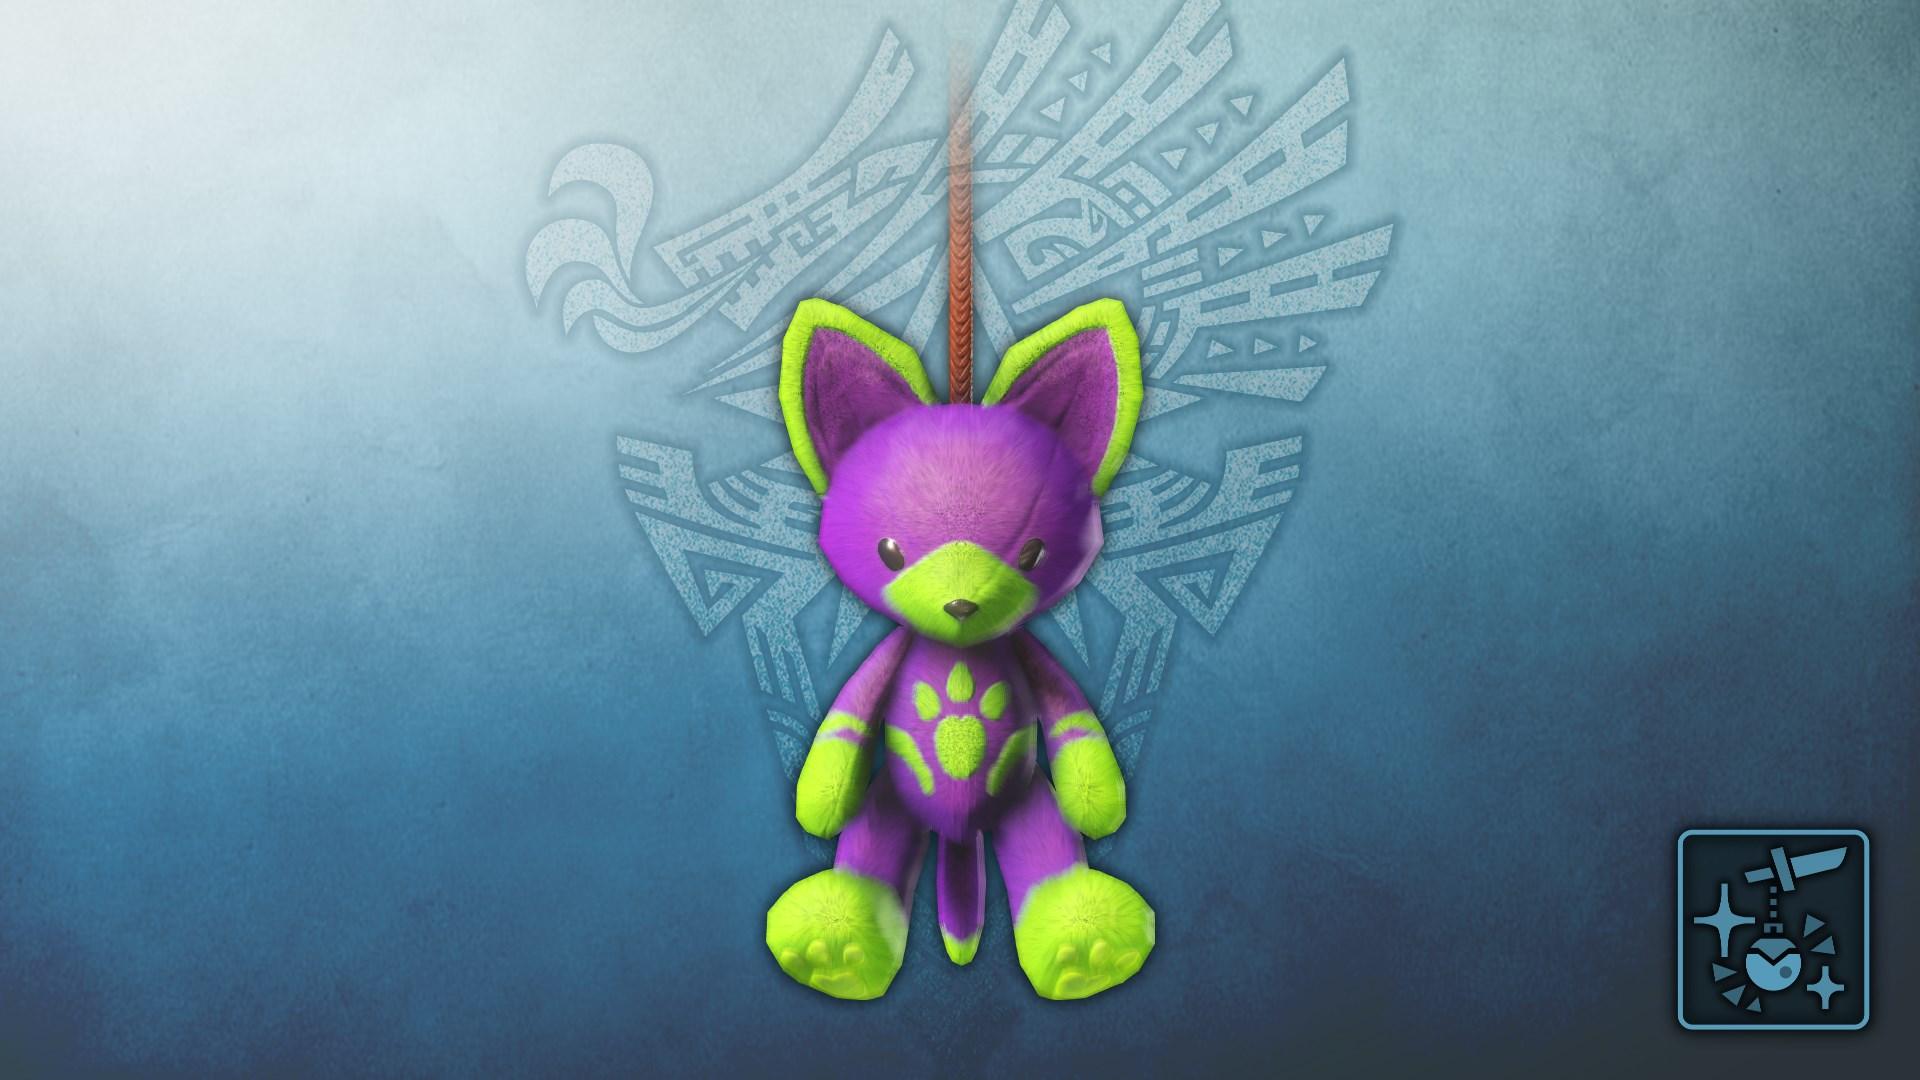 Anhänger: Felynen-Teddy (lila)